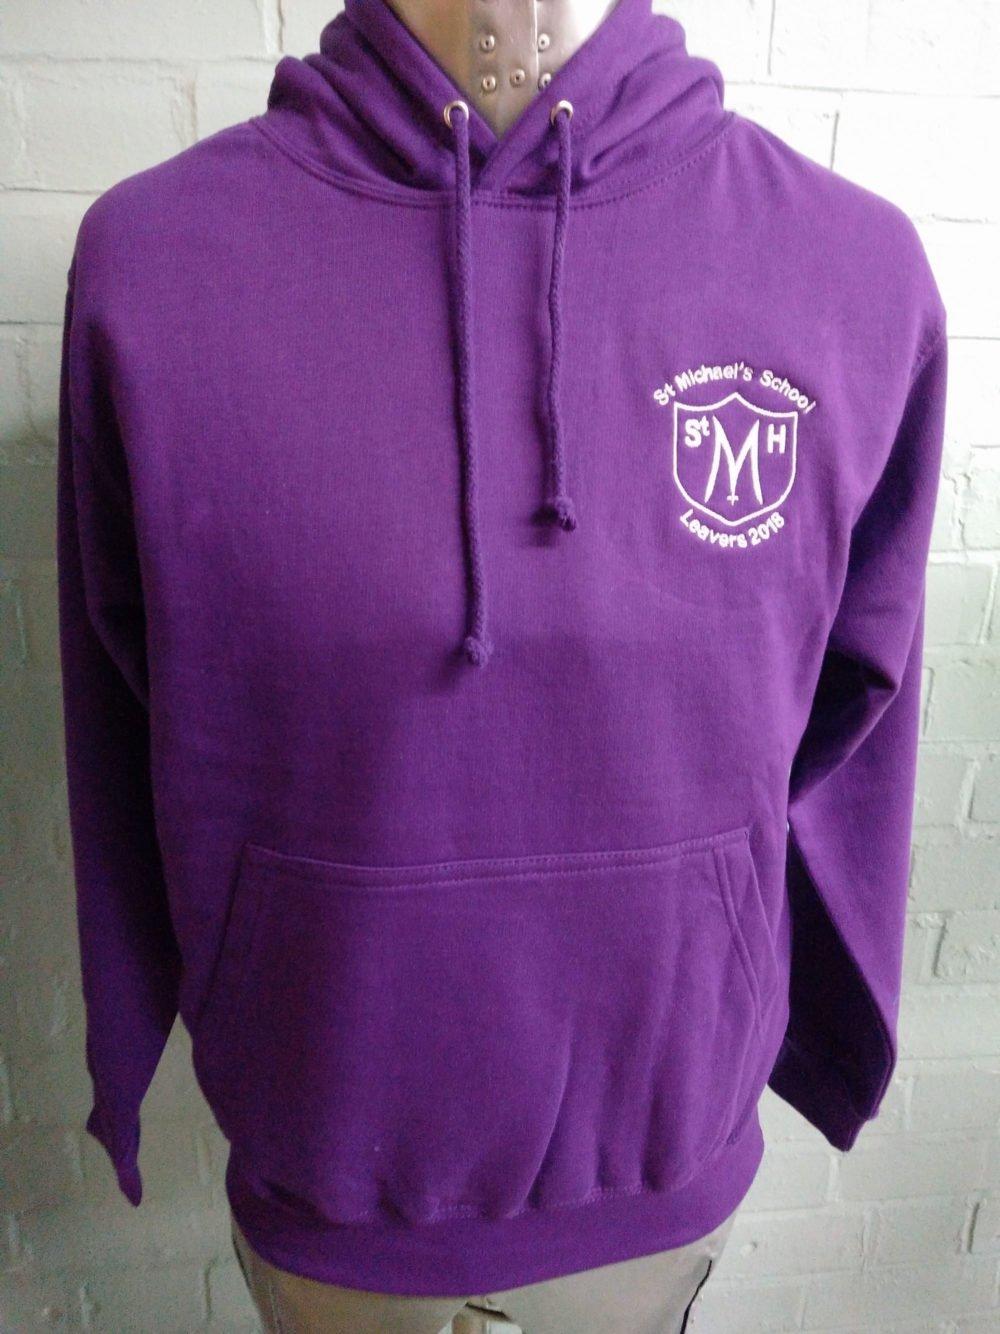 Purple Leavers Hoodies Class of 2018